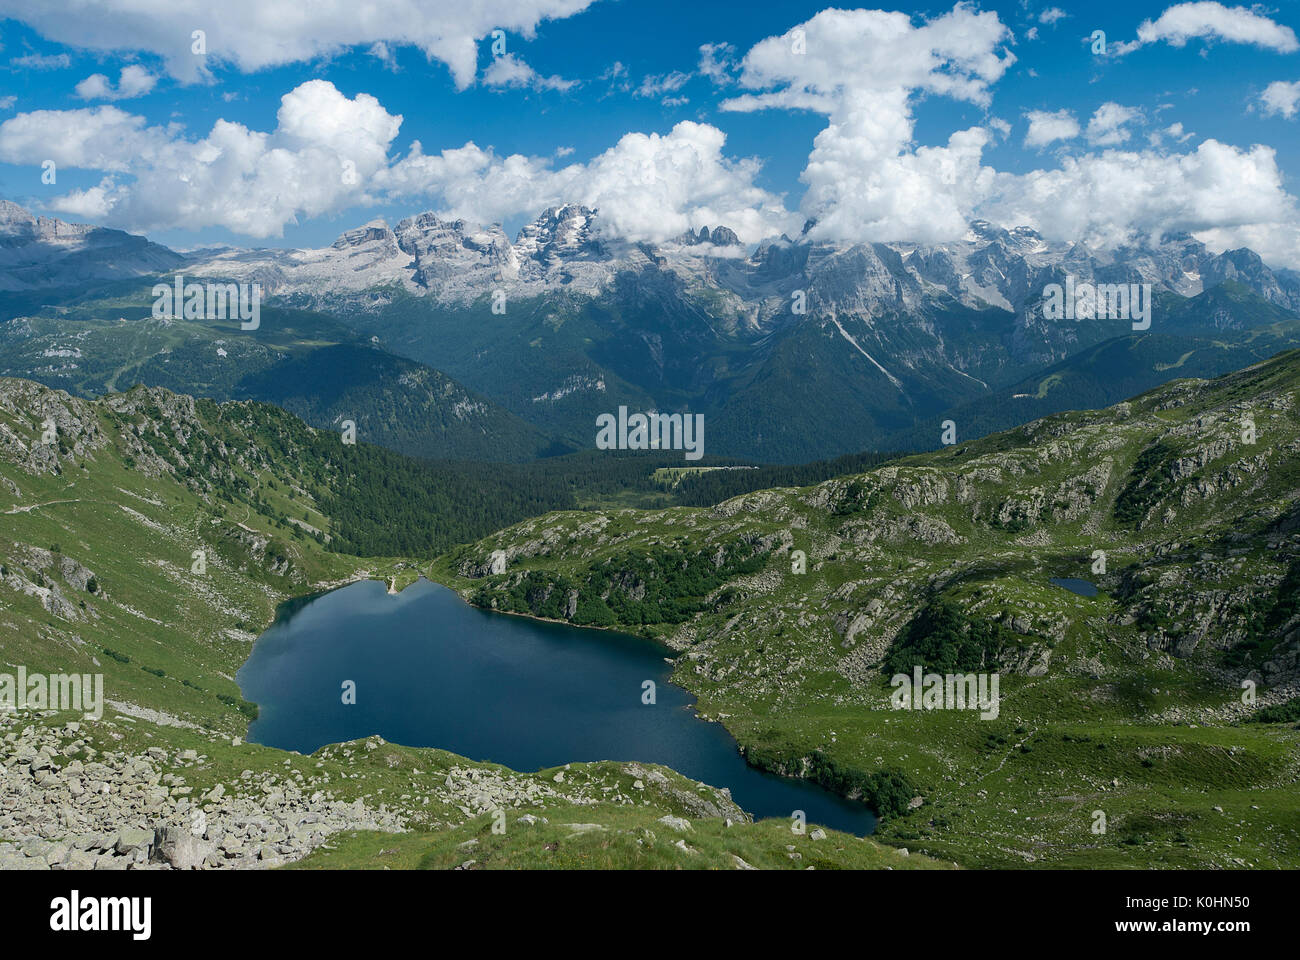 Madonna di Campiglio, Trentino, Italy. The Lake Ritorto with the Brenta mountain group - Stock Image